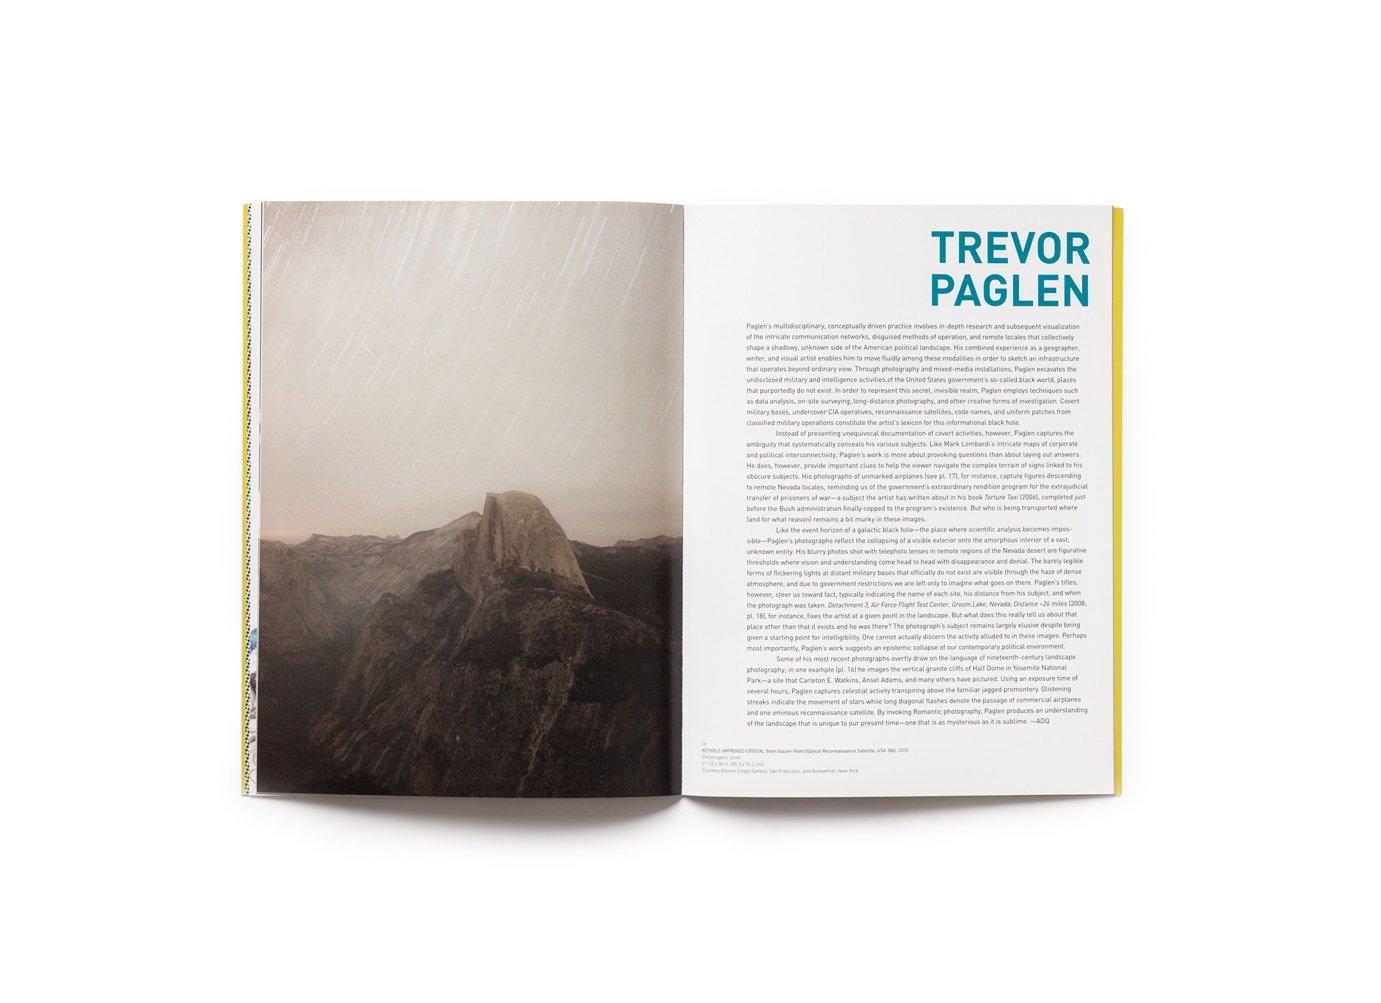 2008 SECA Art Award publication pages 12-13